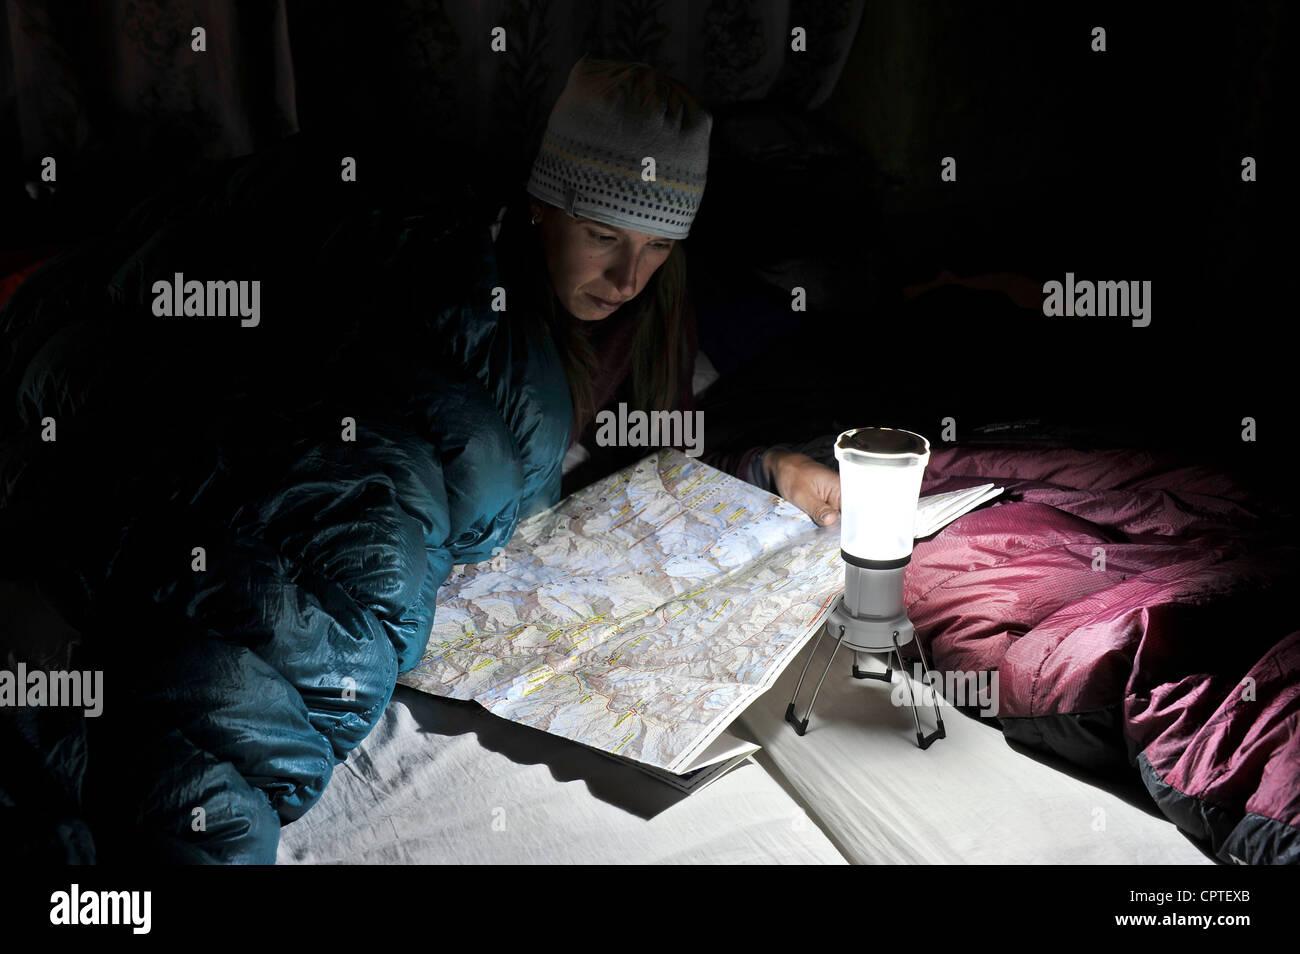 Woman in sleeping bag, looking at trail map, Yak Kharka, Nepal - Stock Image